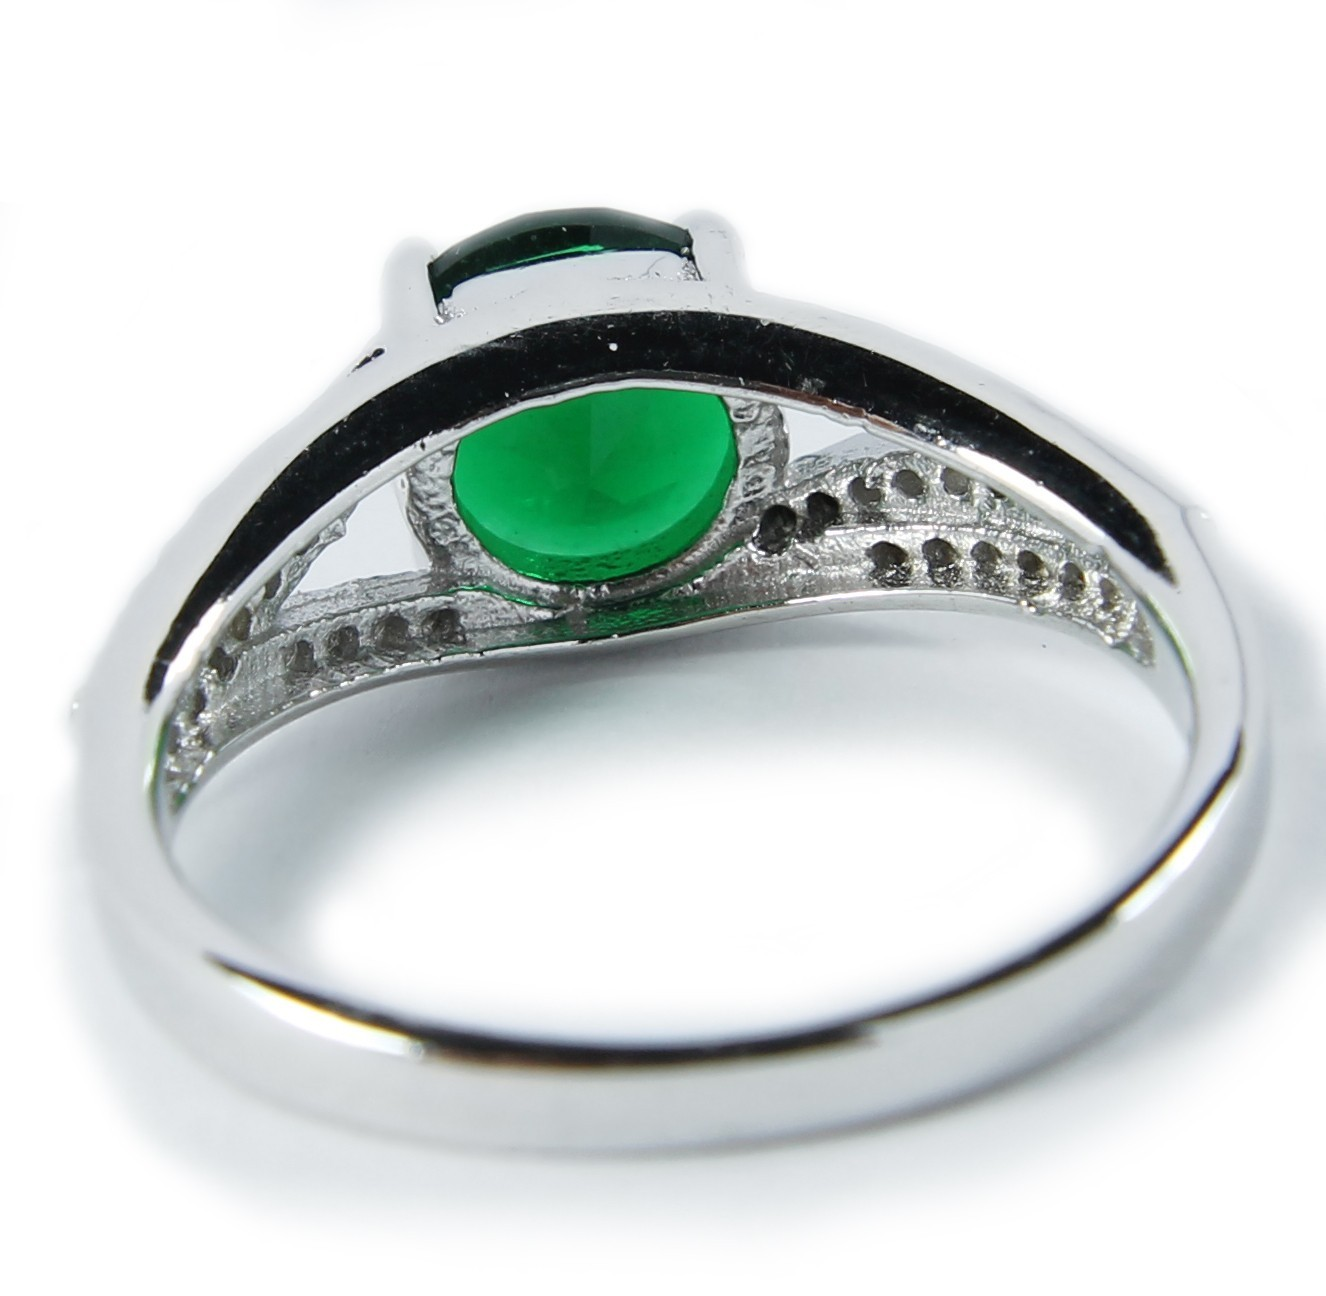 Cheap engagement rings under 100 diamond enement rings for Wedding rings under 150